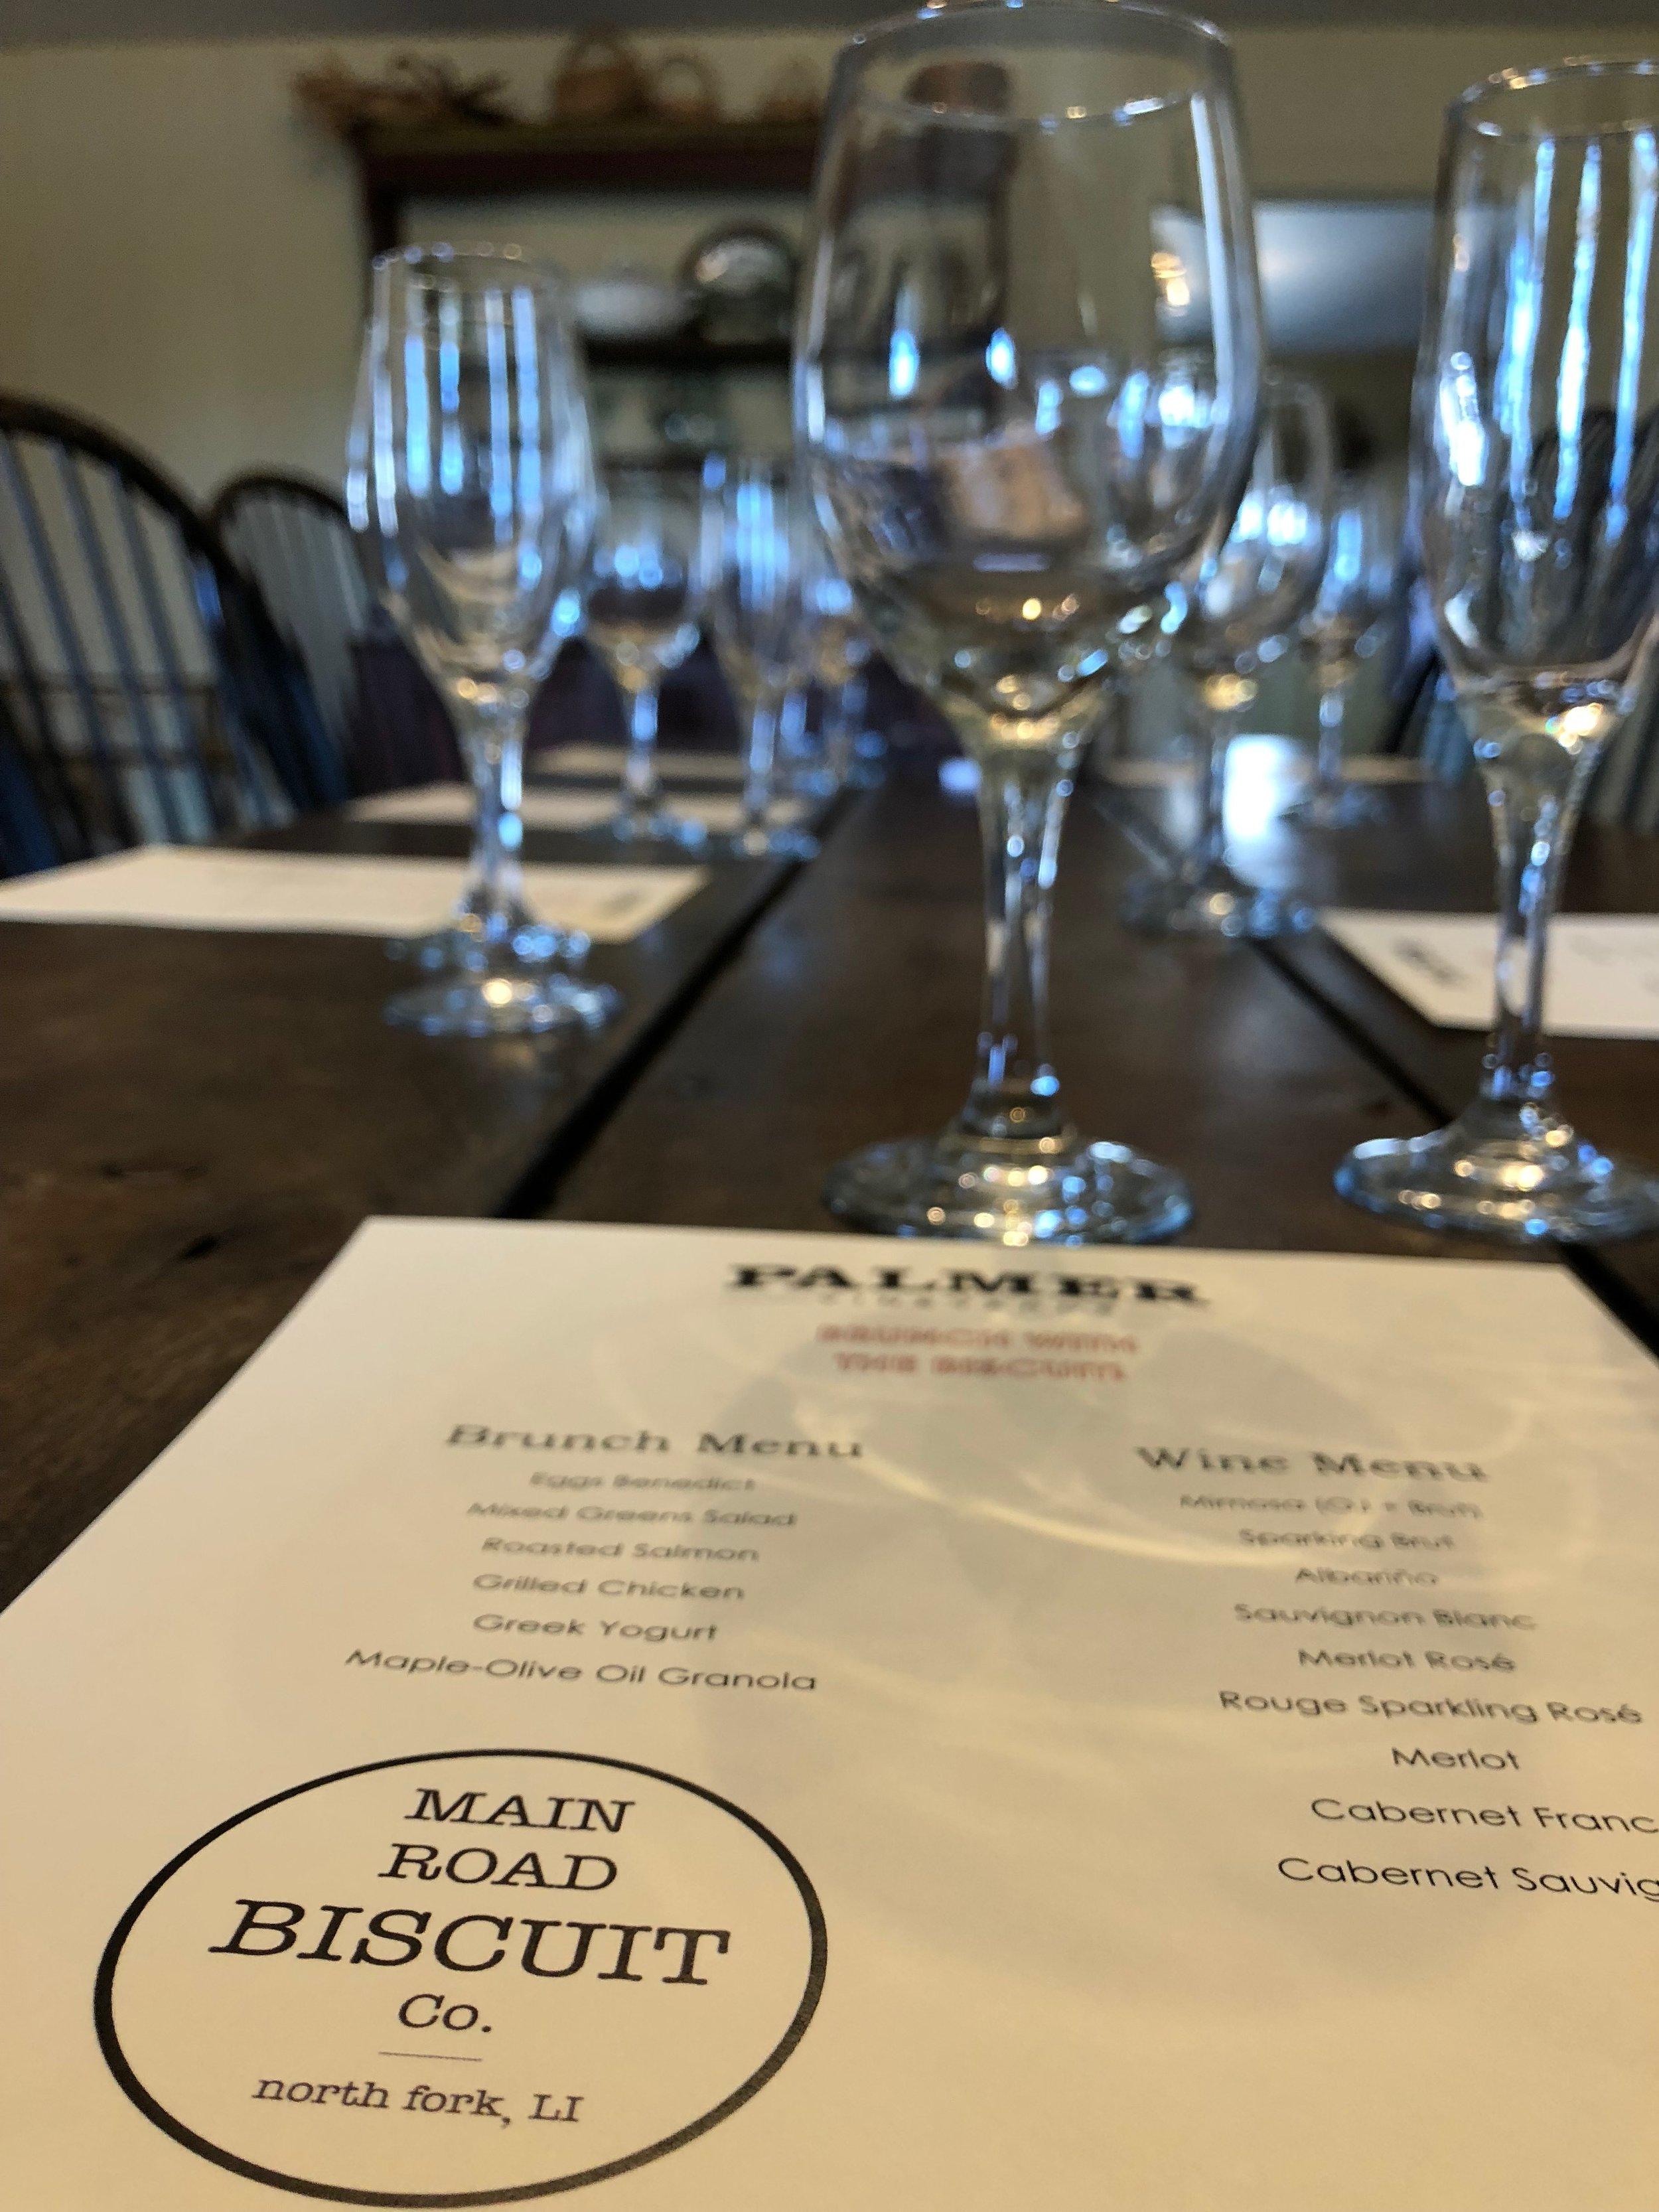 wine dinner menu with wine glasses